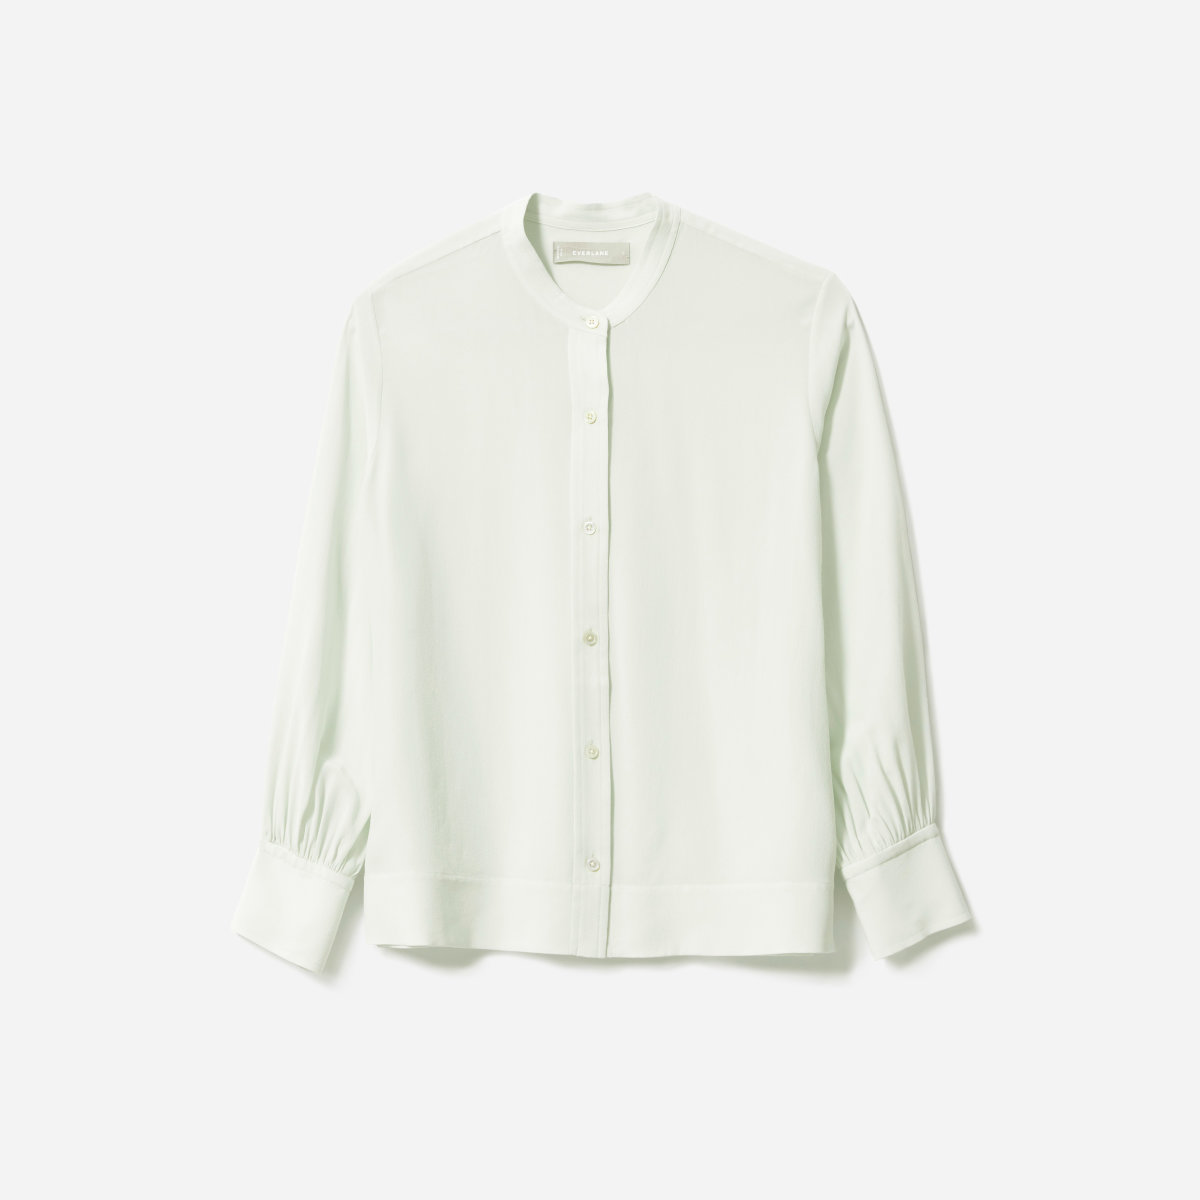 Everlane Choose What You Pay / Silk Shirt - Sunshine Style, A Florida Based Fashion Blog